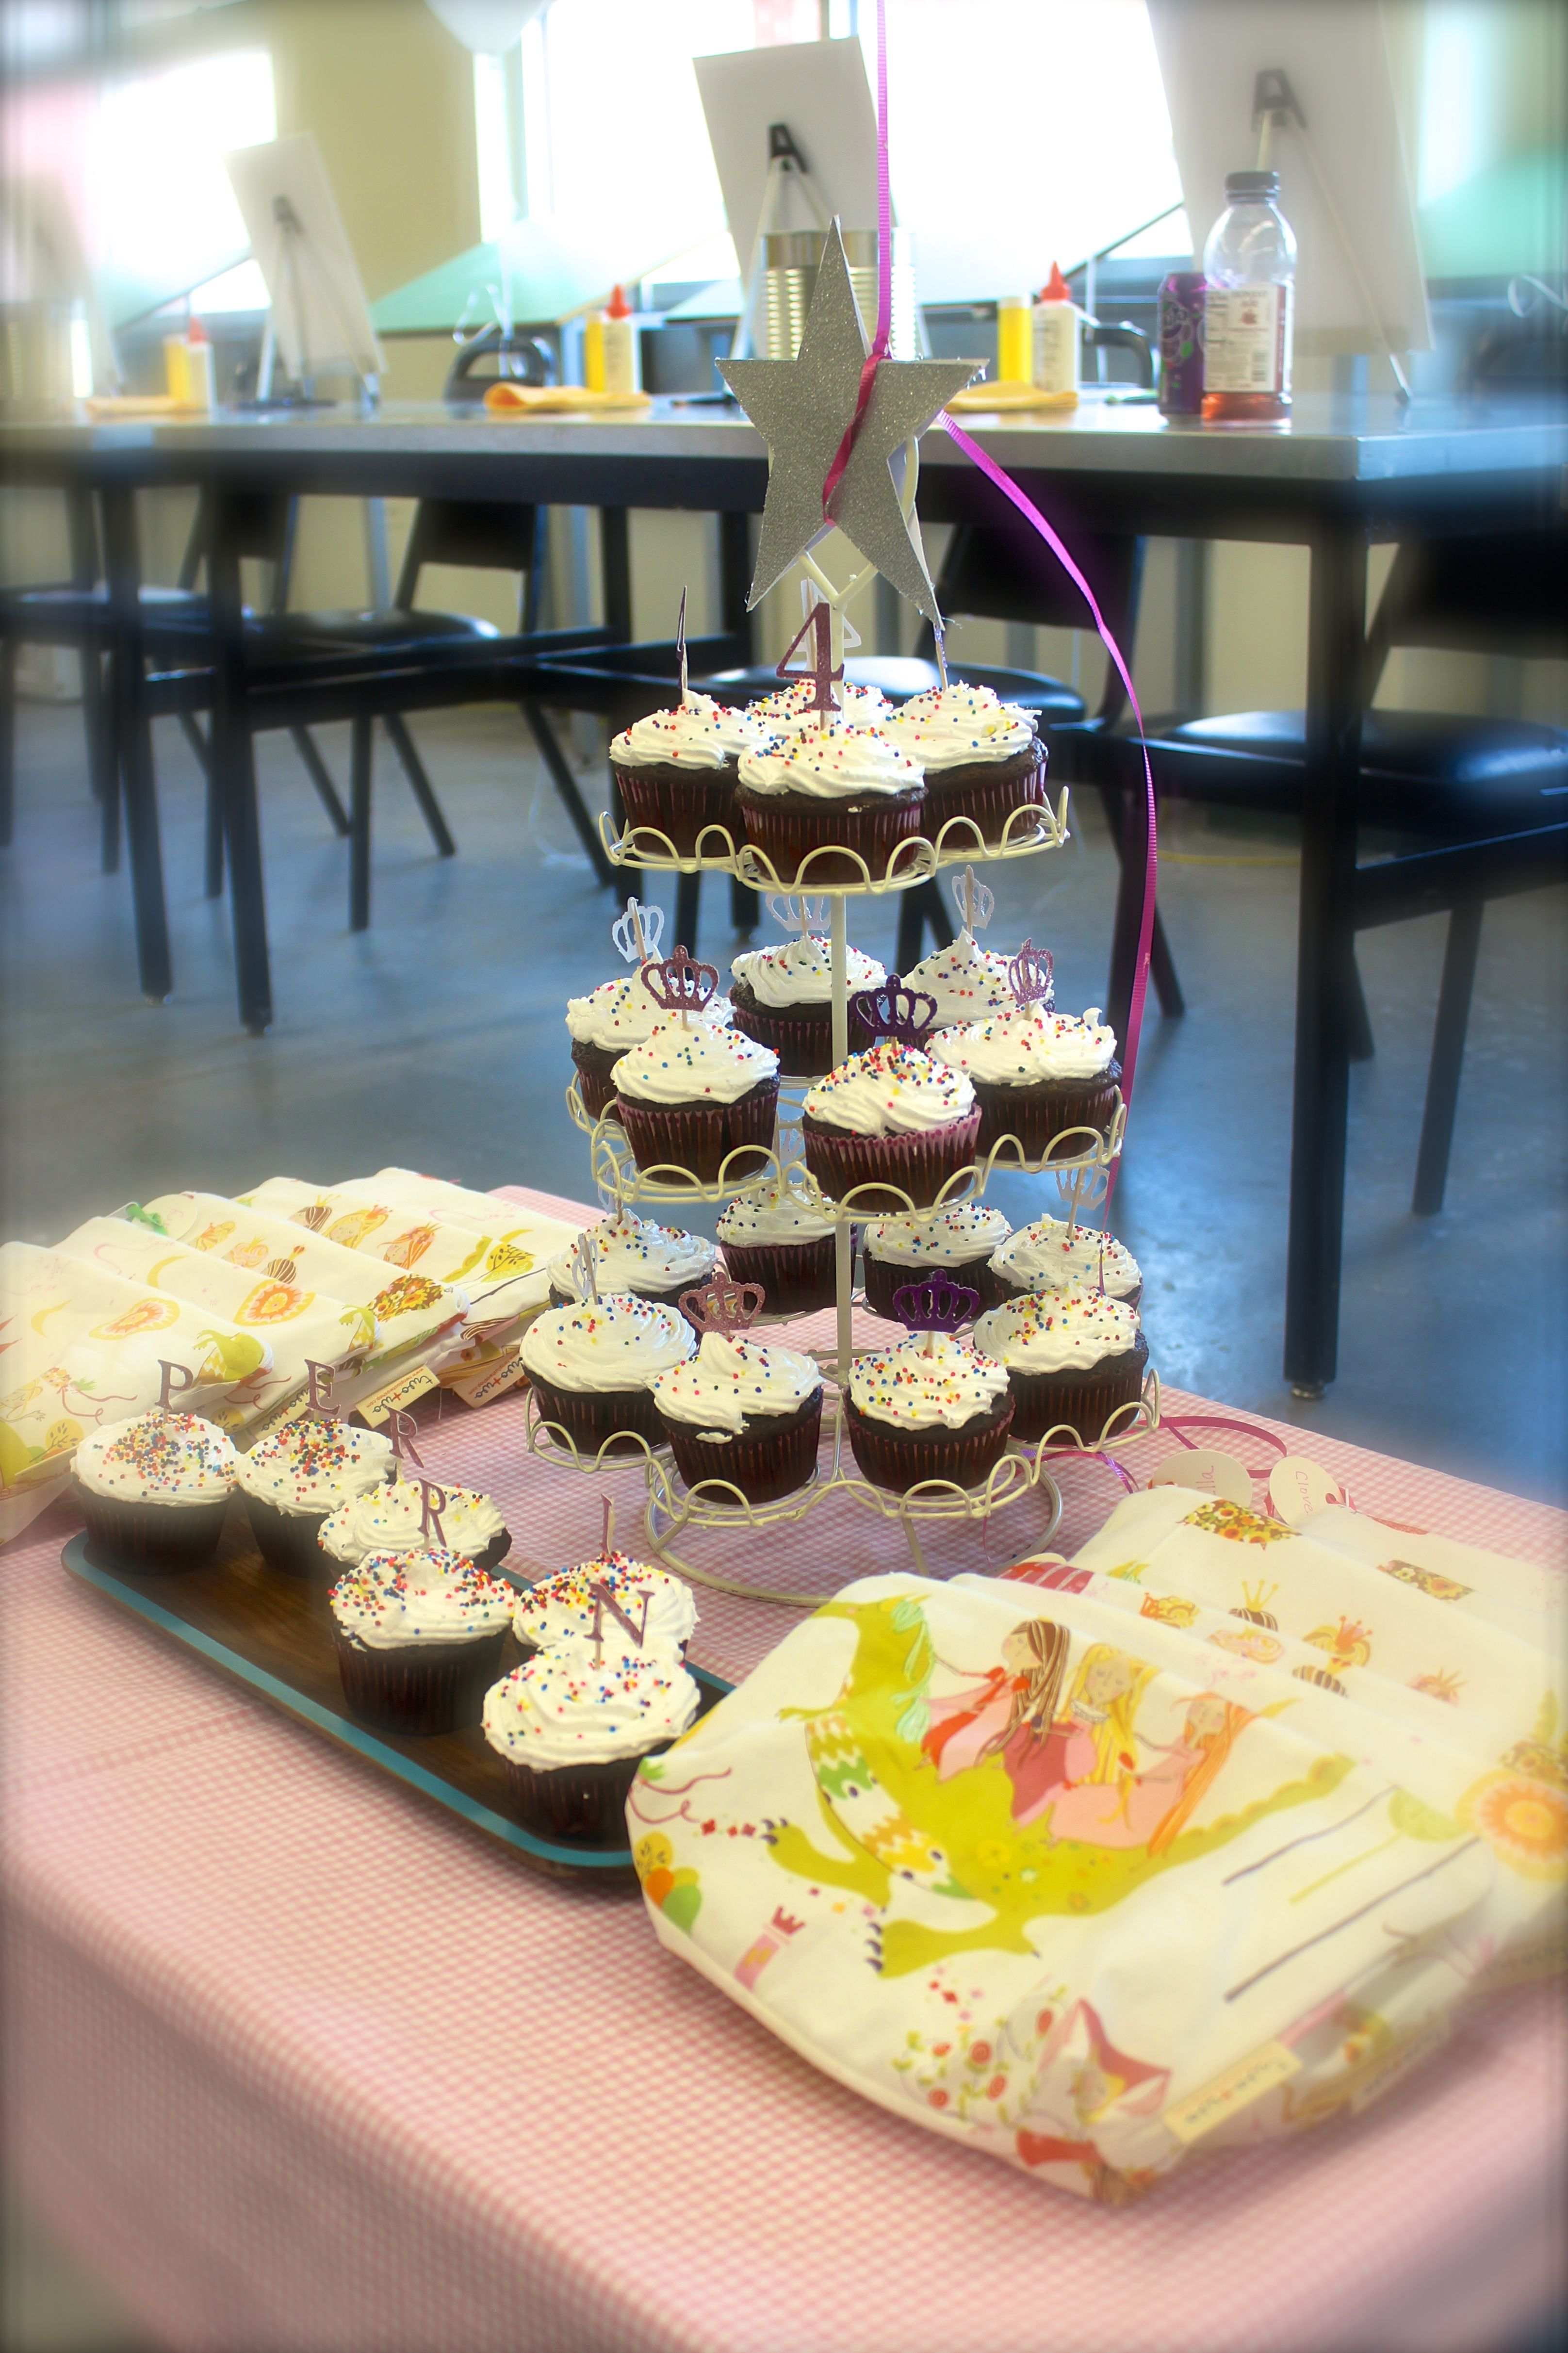 HANDMAKERY cupcakes